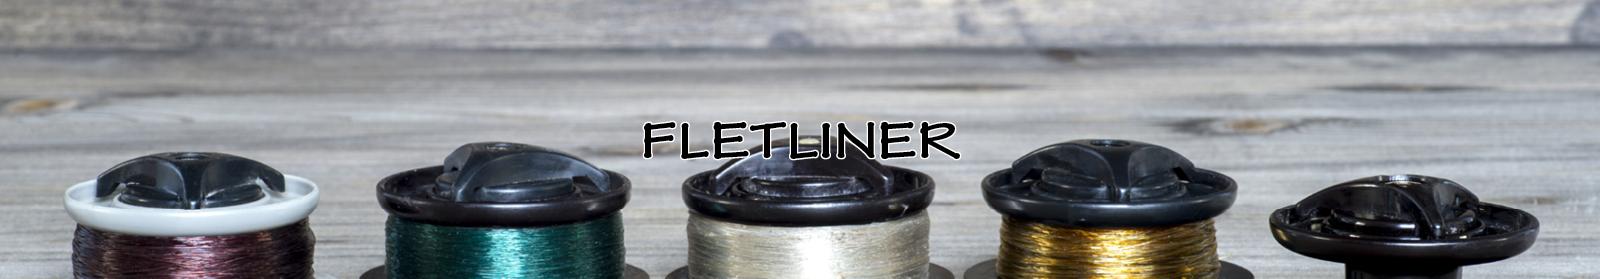 Fletliner hos LYSTFISKEREN.dk